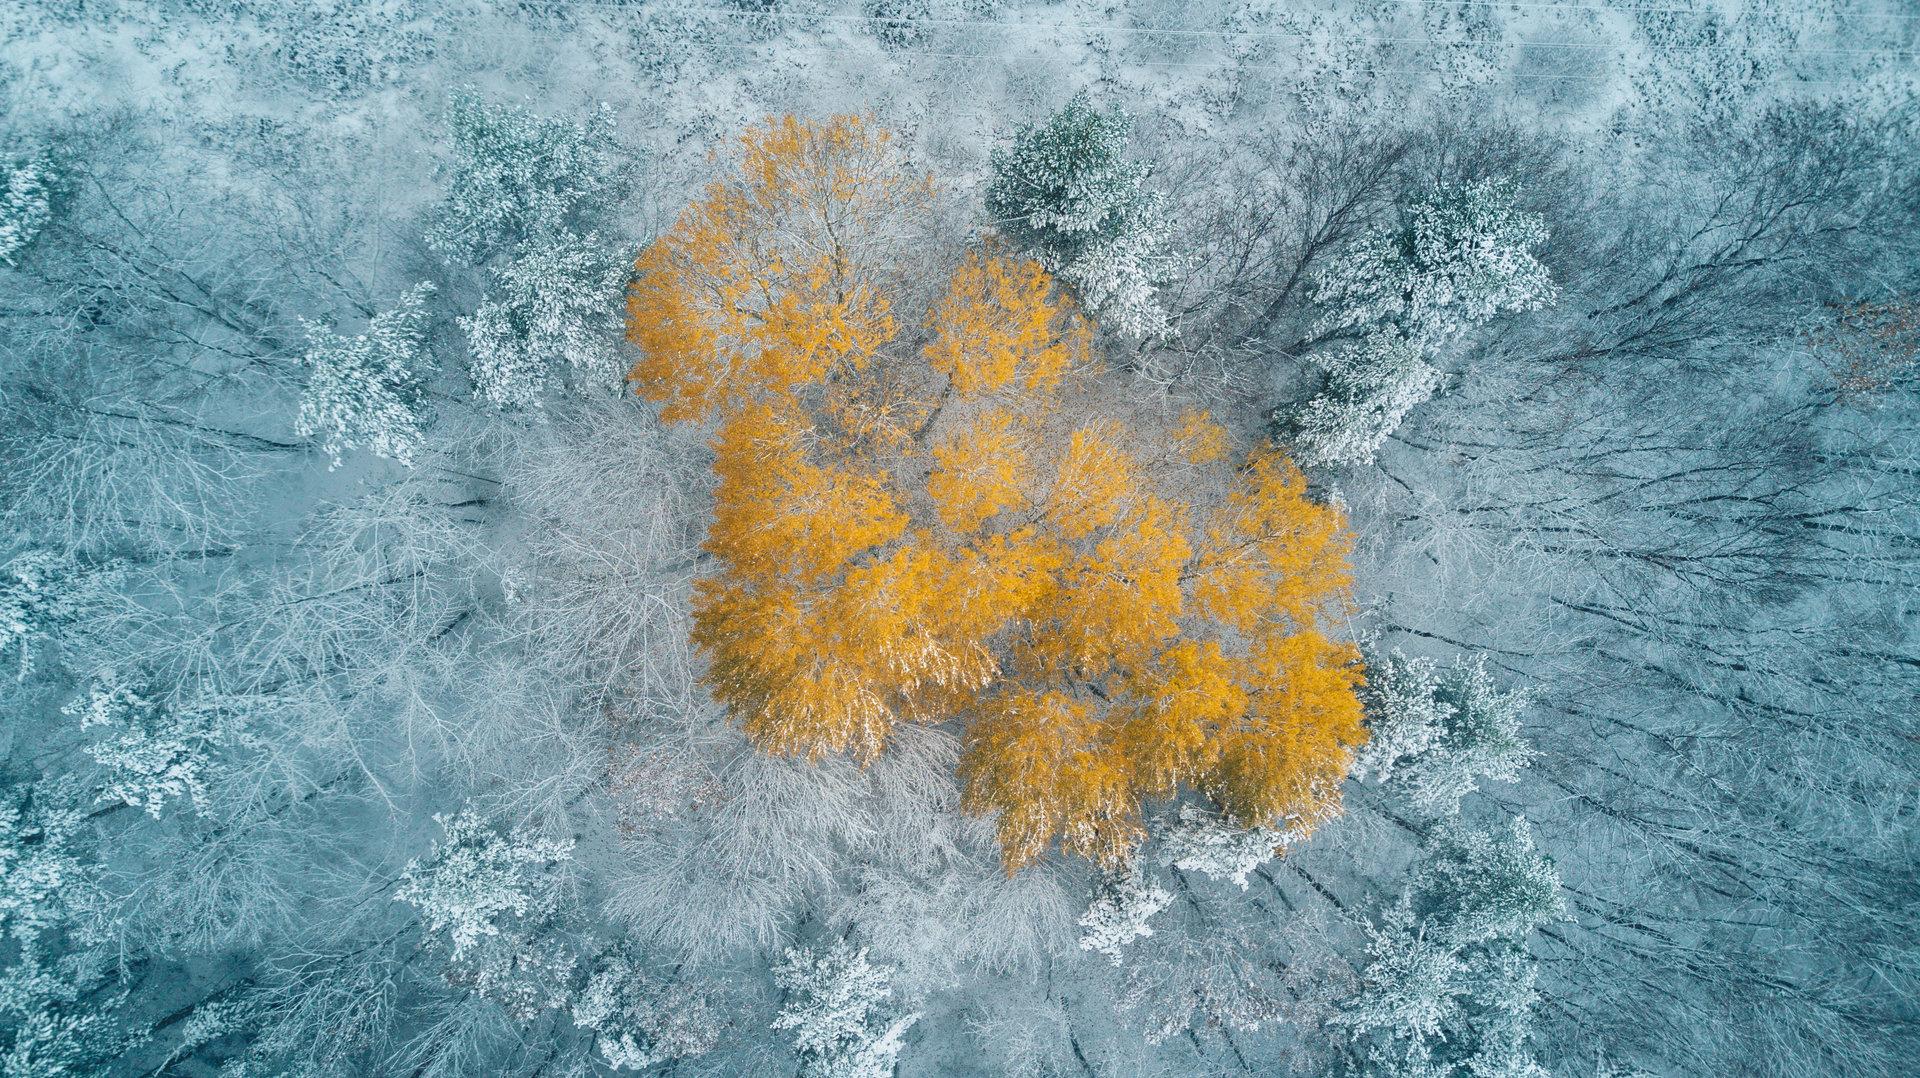 Photo in Aerial | Author Илия Димитров - iliya.d | PHOTO FORUM